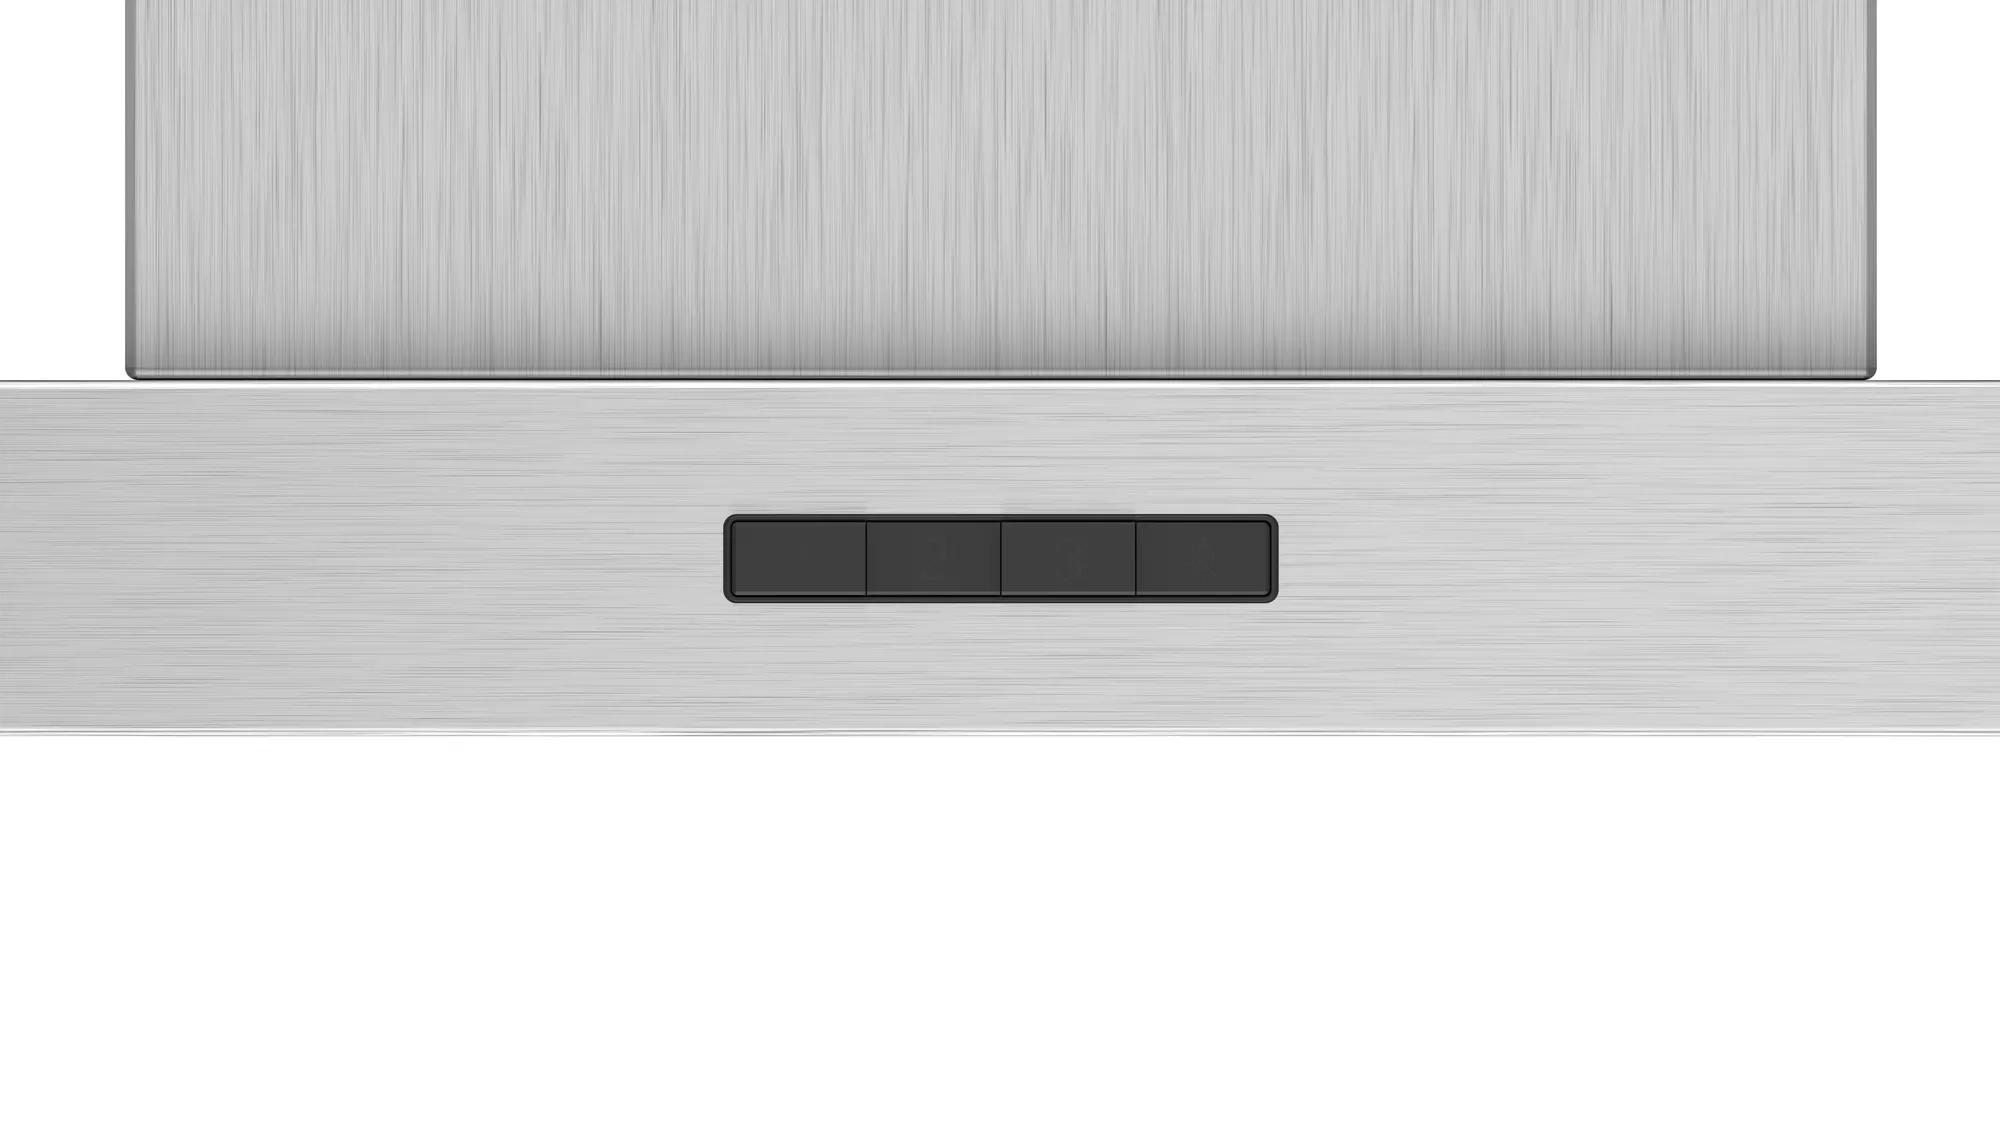 Aspirator Bosch  DWB64BC52  - 2